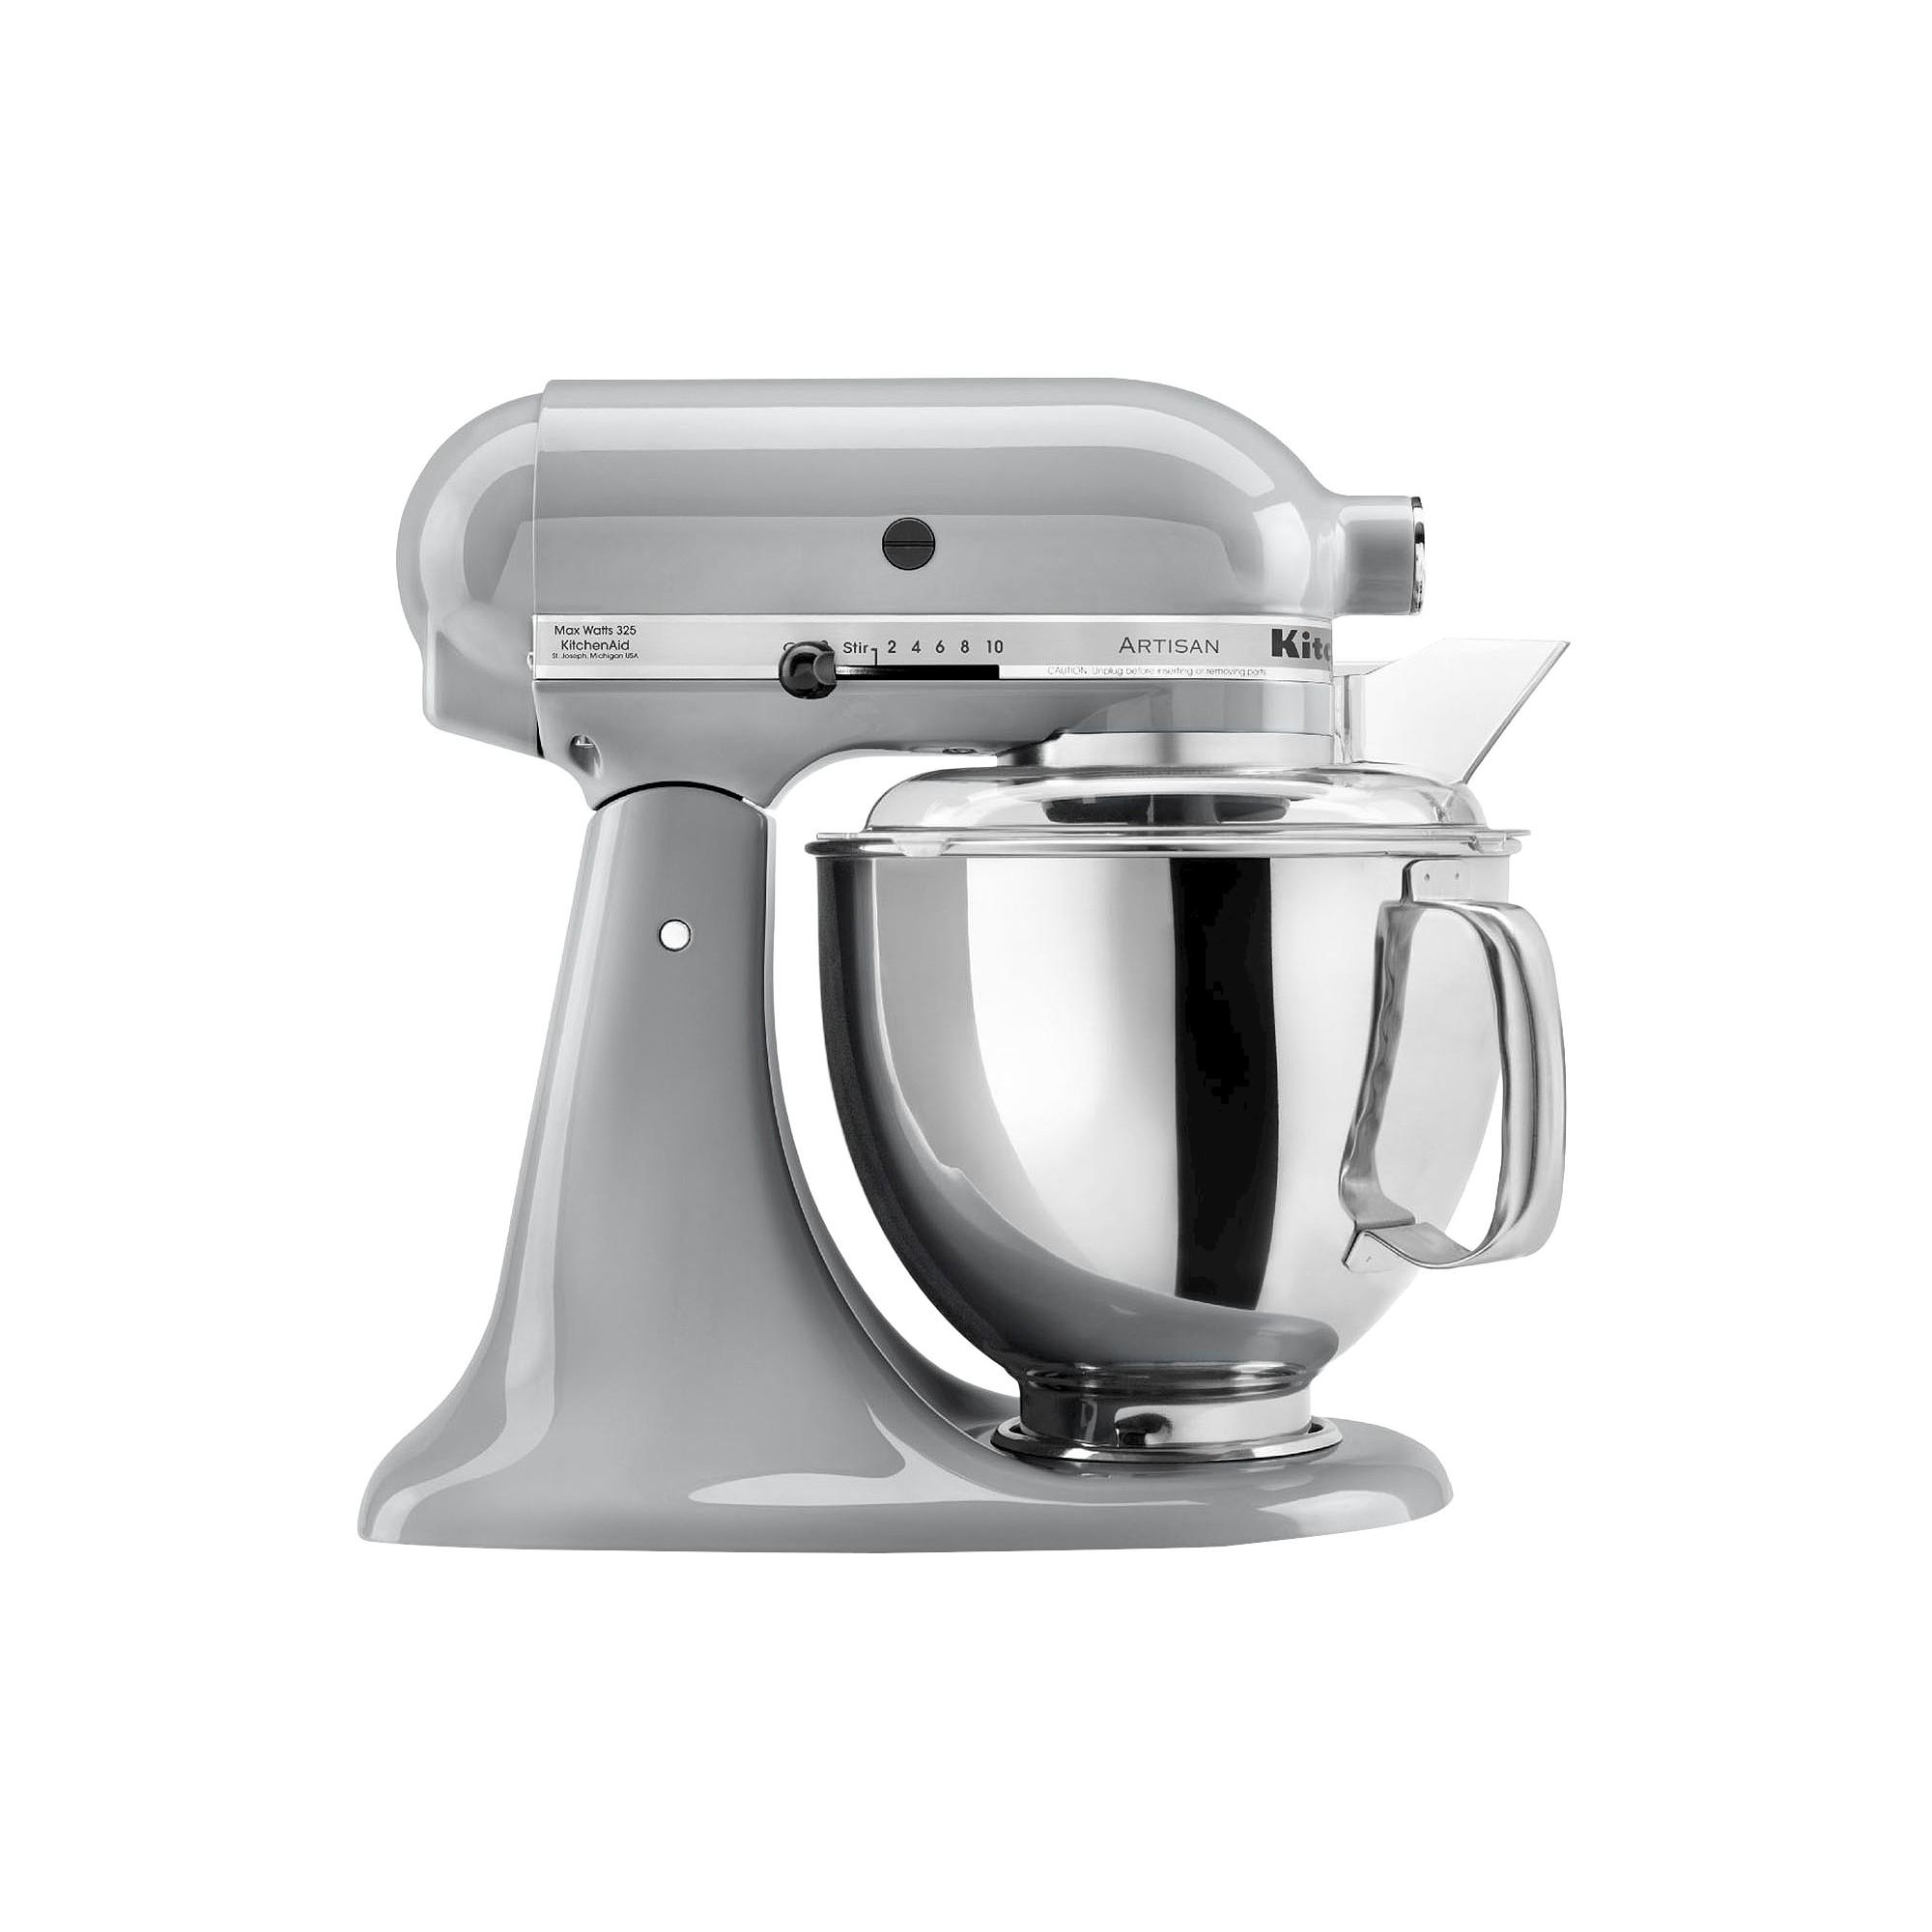 Kitchenaid Artisan Series 5 Quart Tilt Head Stand Mixer Ksm150